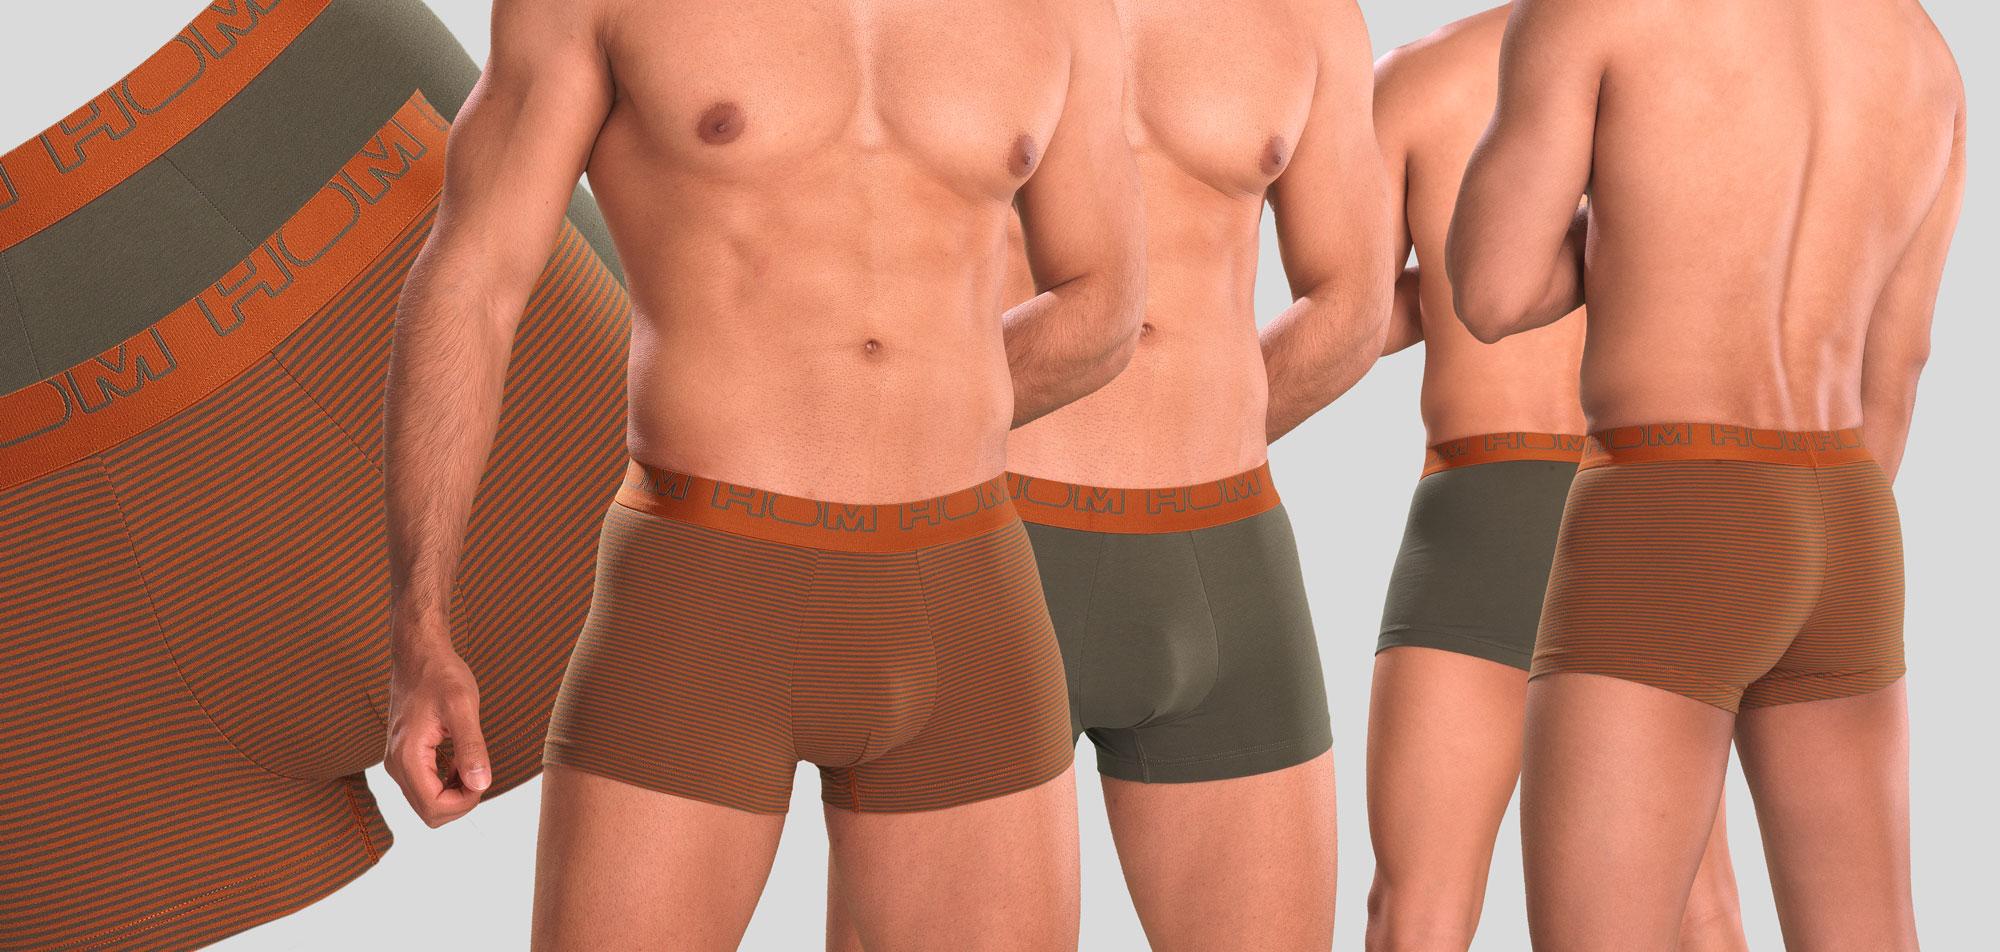 Hom Frank Boxer Briefs 2-Pack 942-Groen/Oranje (920)-XL